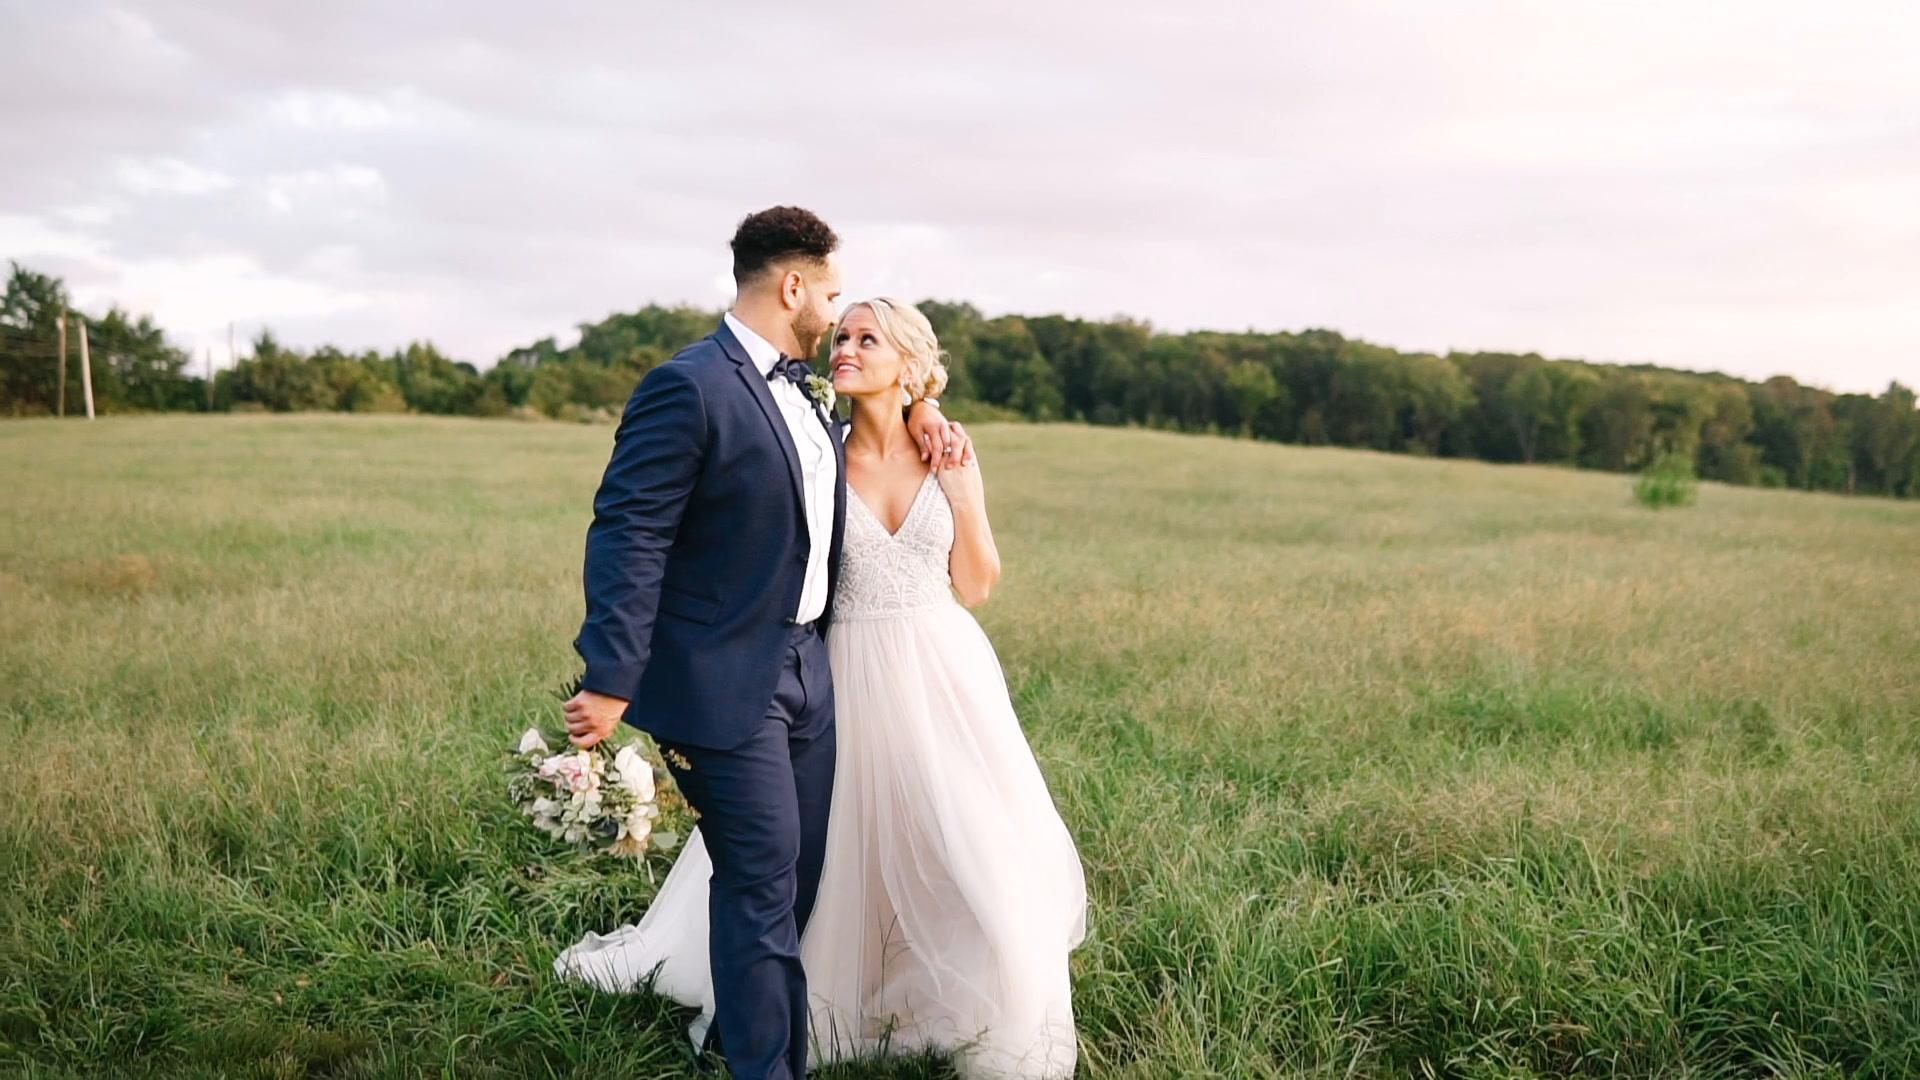 2019 Wedding Recap + Best Moments | Virginia, Virginia | various venues